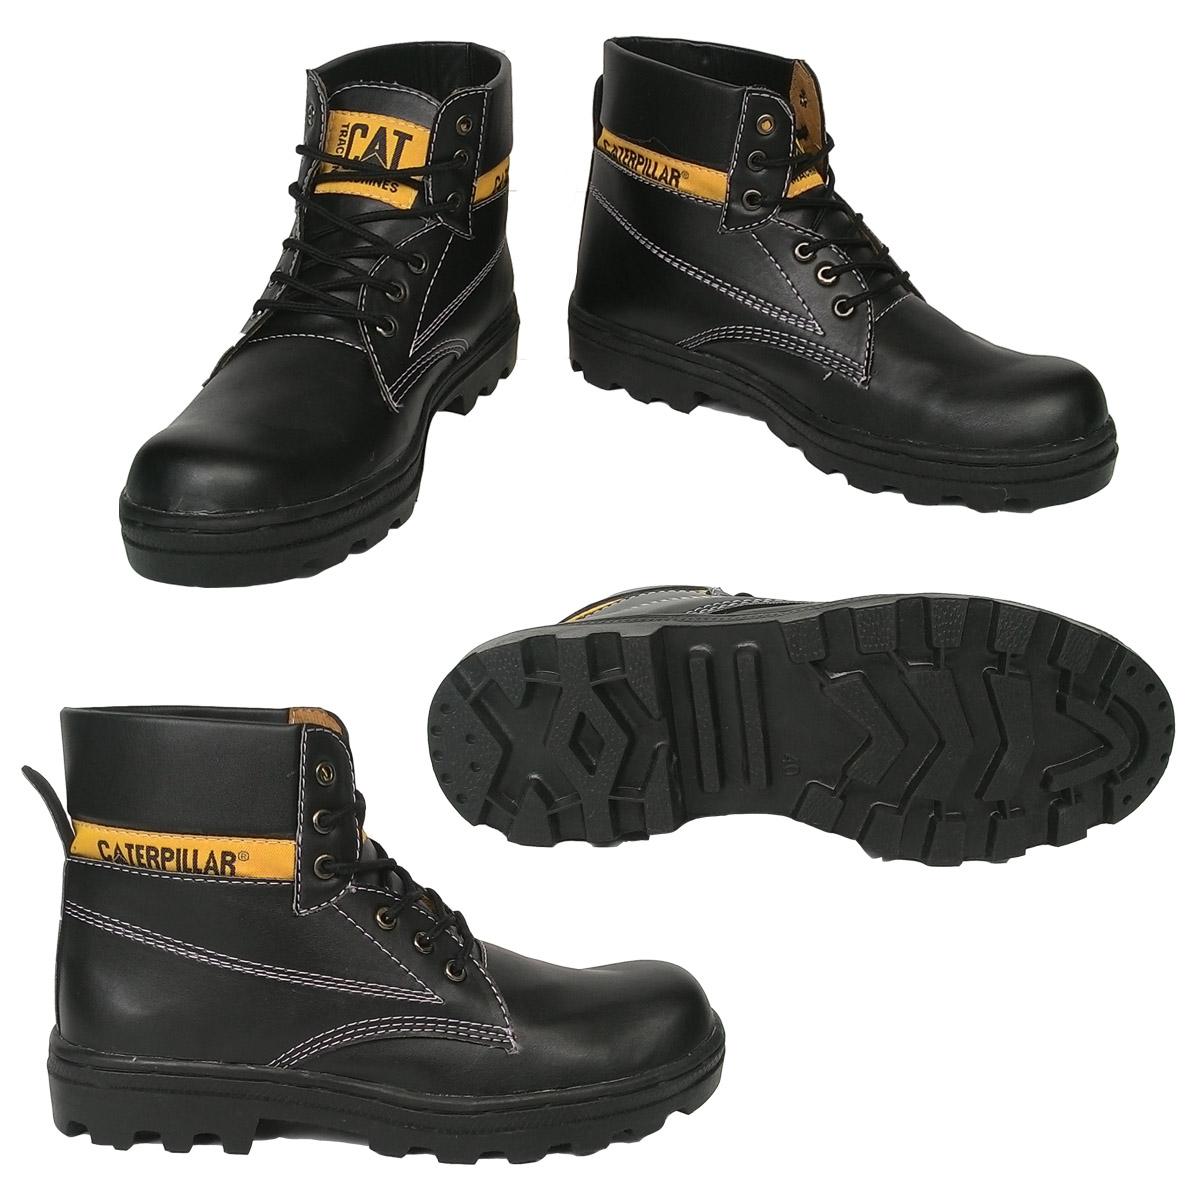 p9-55| Sepatu Pria Boots Safety Caterpillar Bahan Hitam Licin